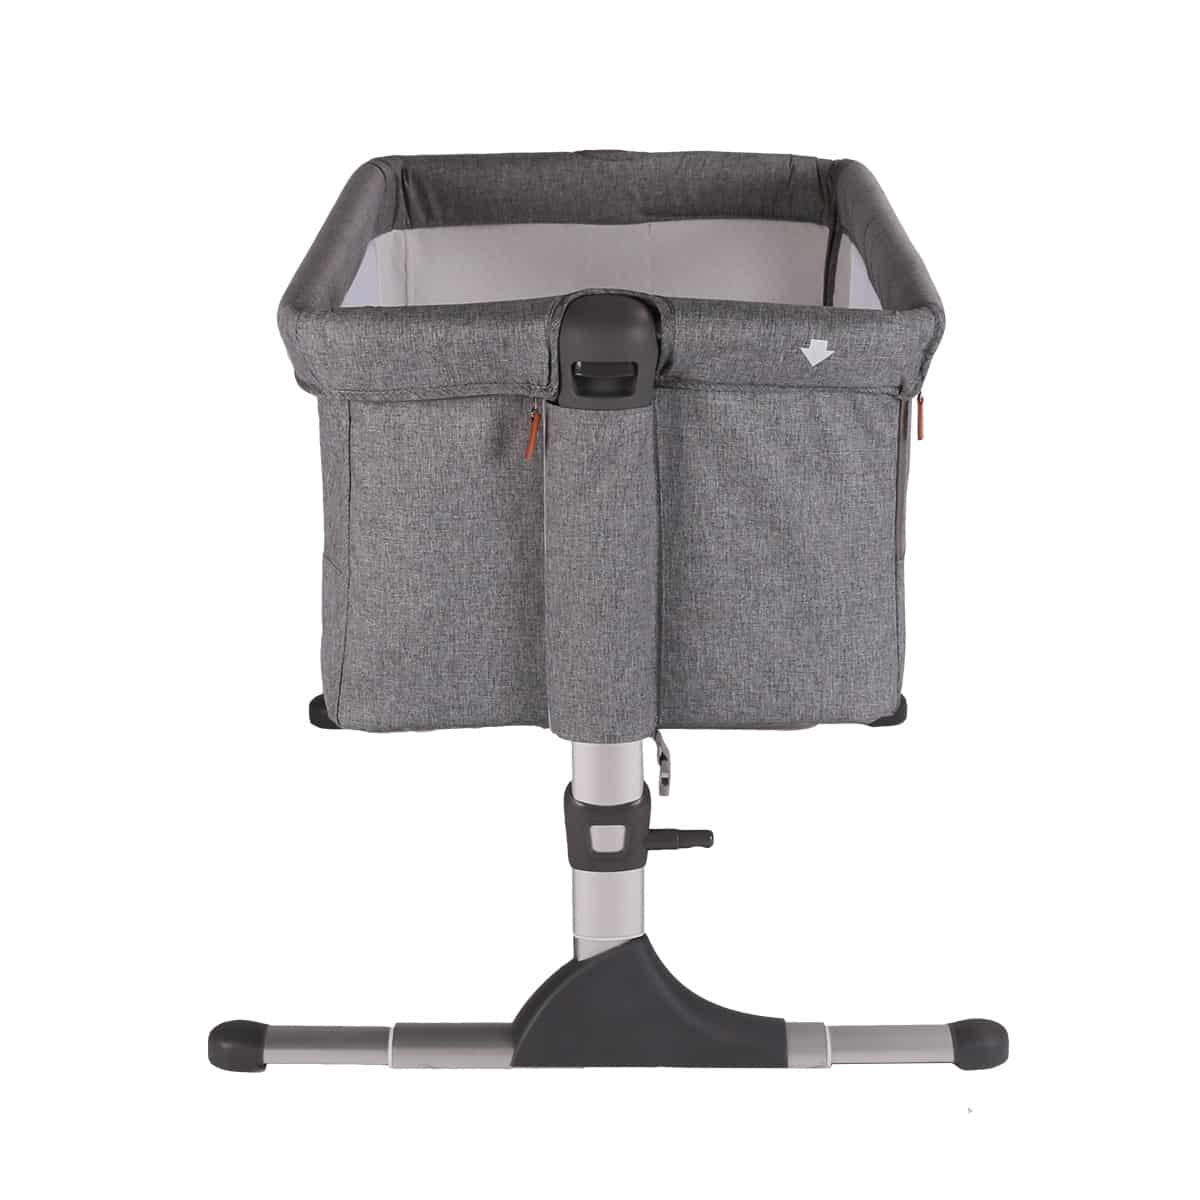 The Hush Co-Sleeper has multiple height adjustments